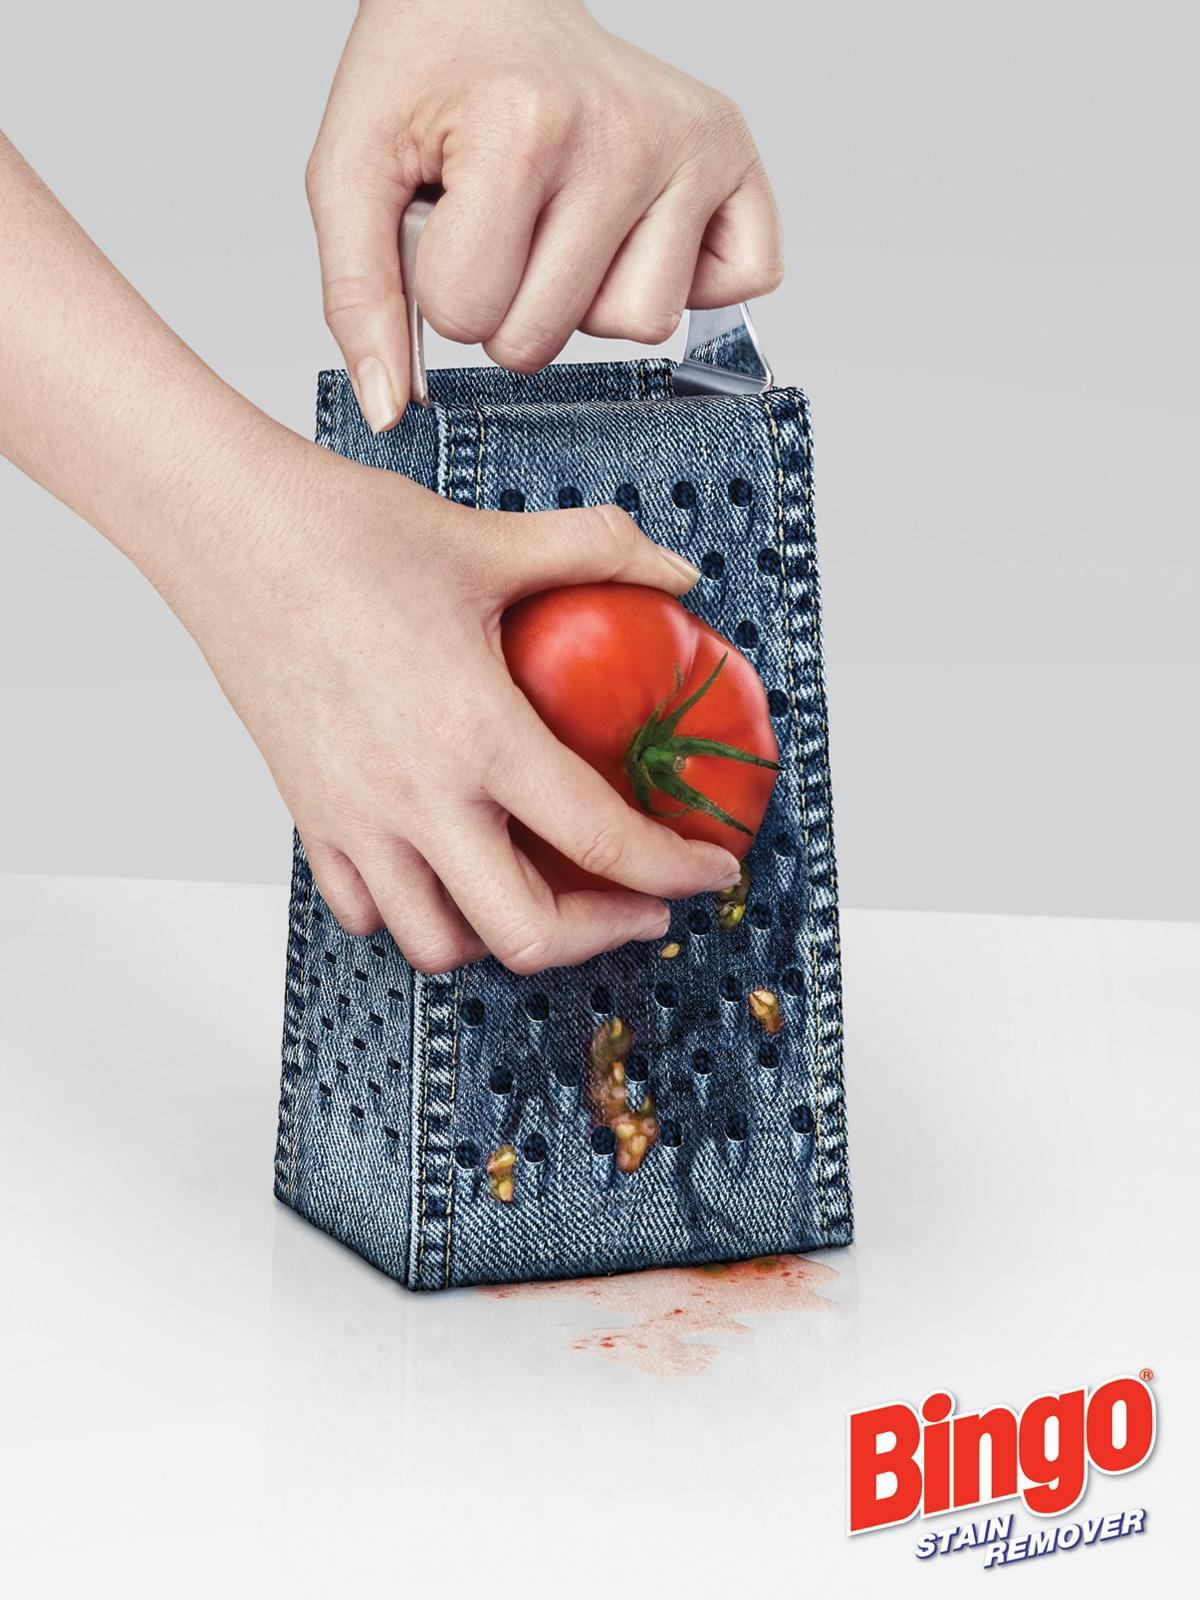 Bingo Print Ad -  Grater